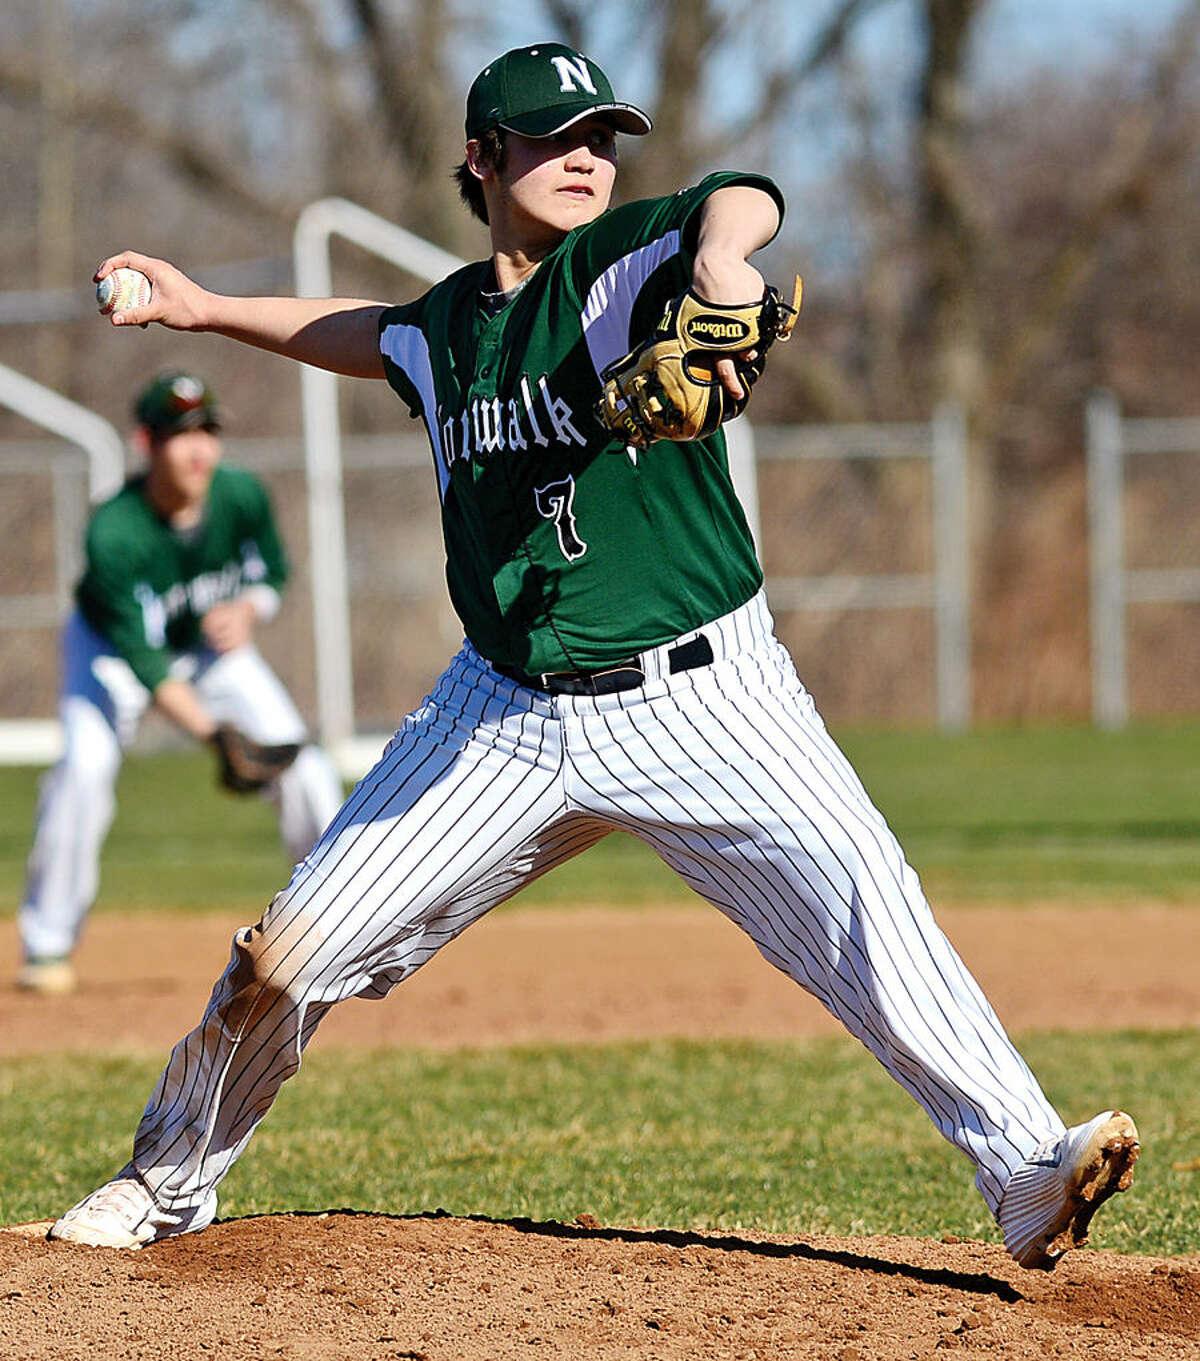 Hour photo / Erik Trautmann Norwalk High School's #7 Mike Gonzalez pitches in their intra city baseball game against Brien McMahon High School Saturday.